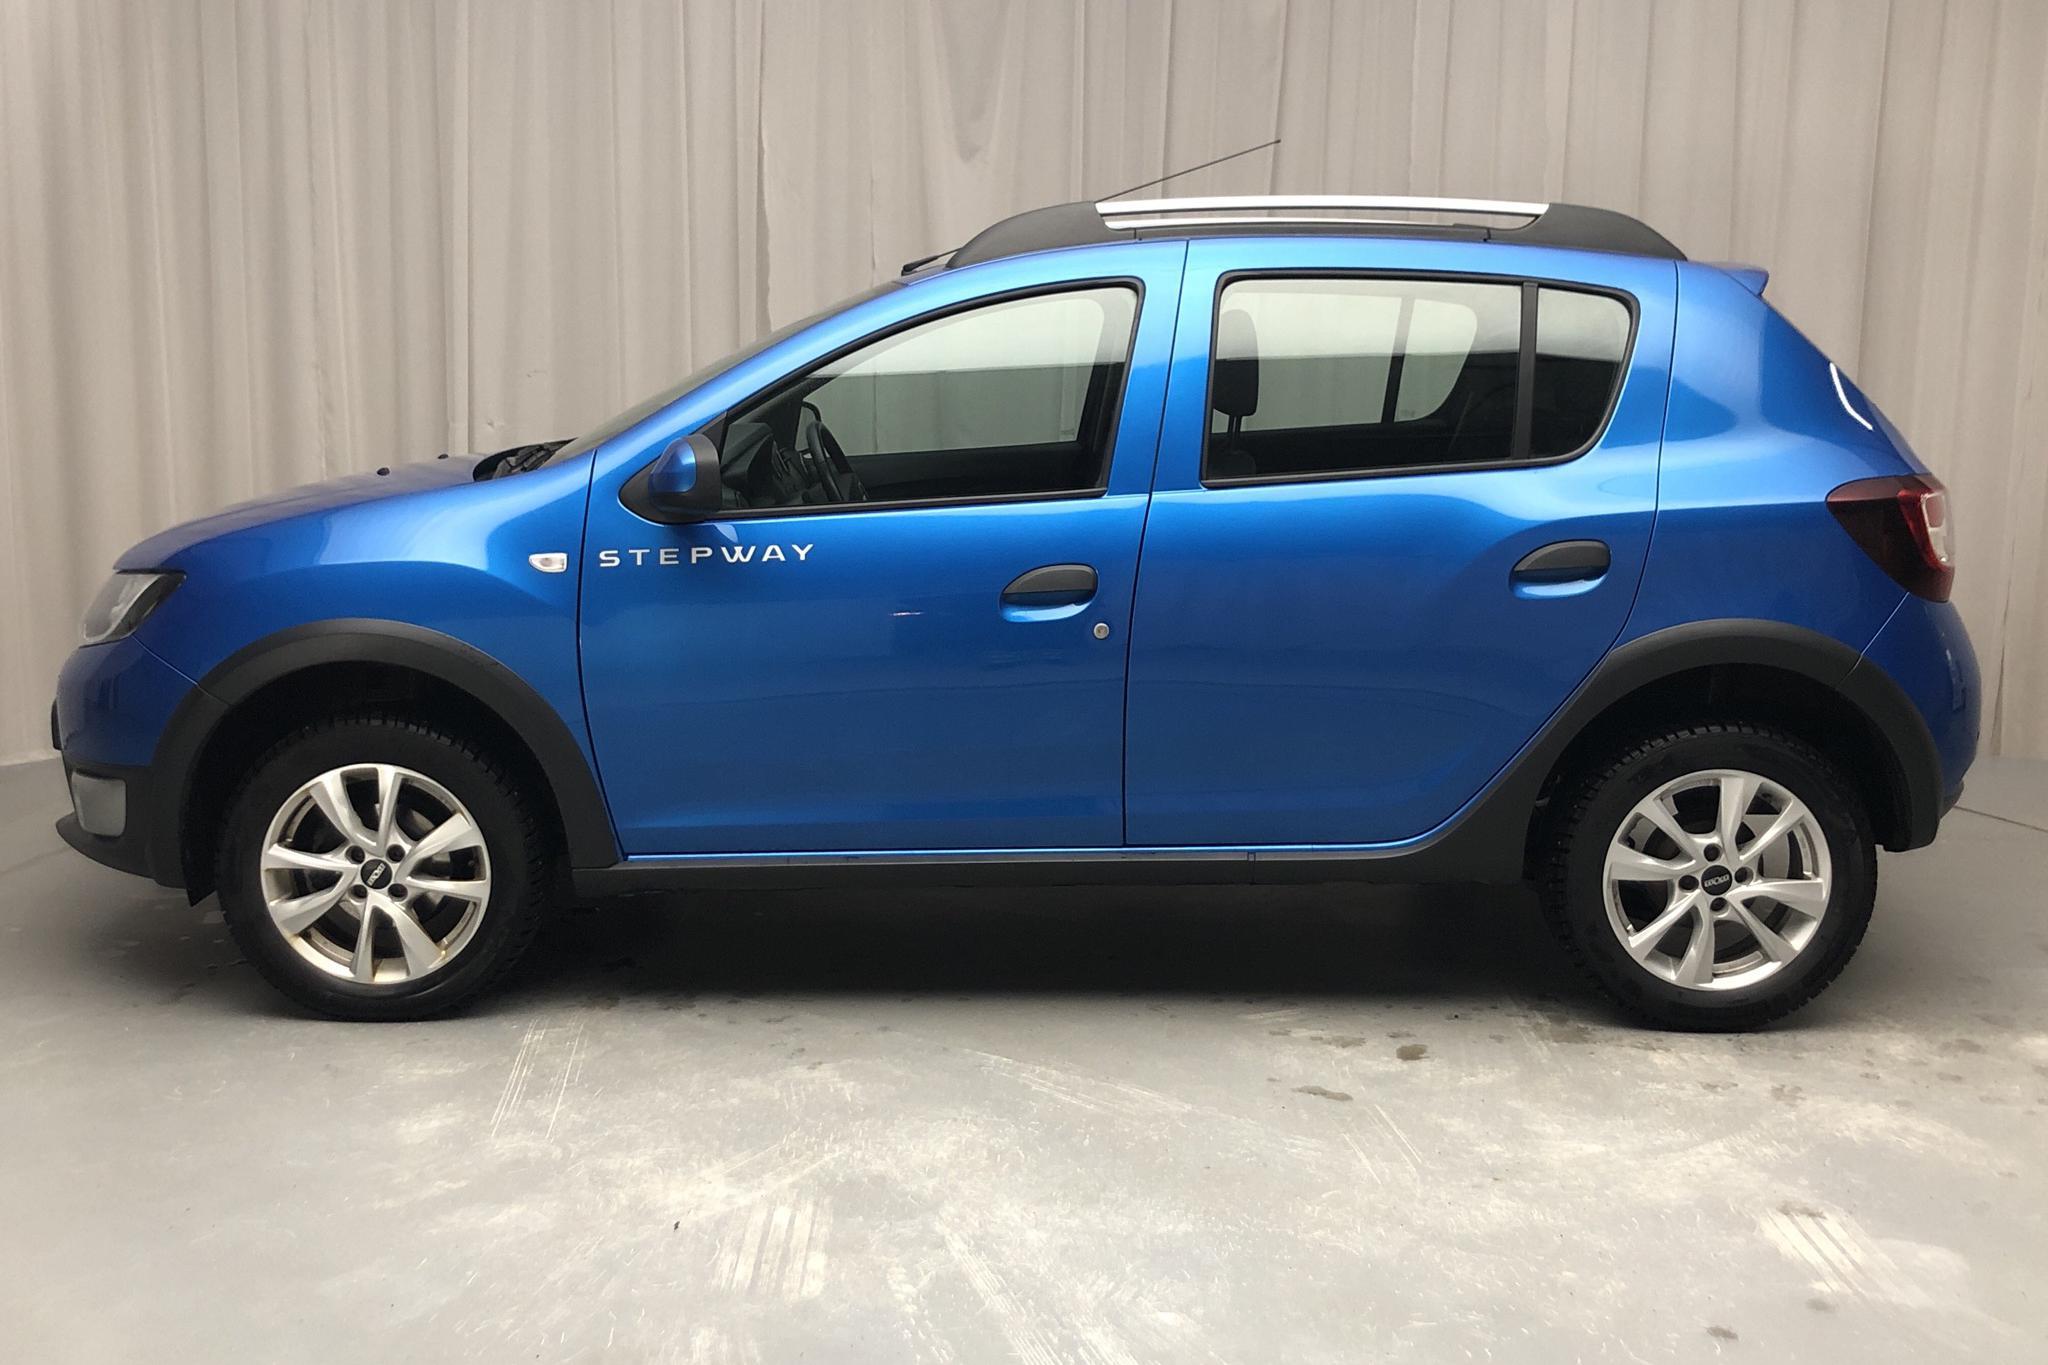 Dacia Sandero 1.5 dCi Stepway (90hk) - 10 448 mil - Manuell - Light Blue - 2015